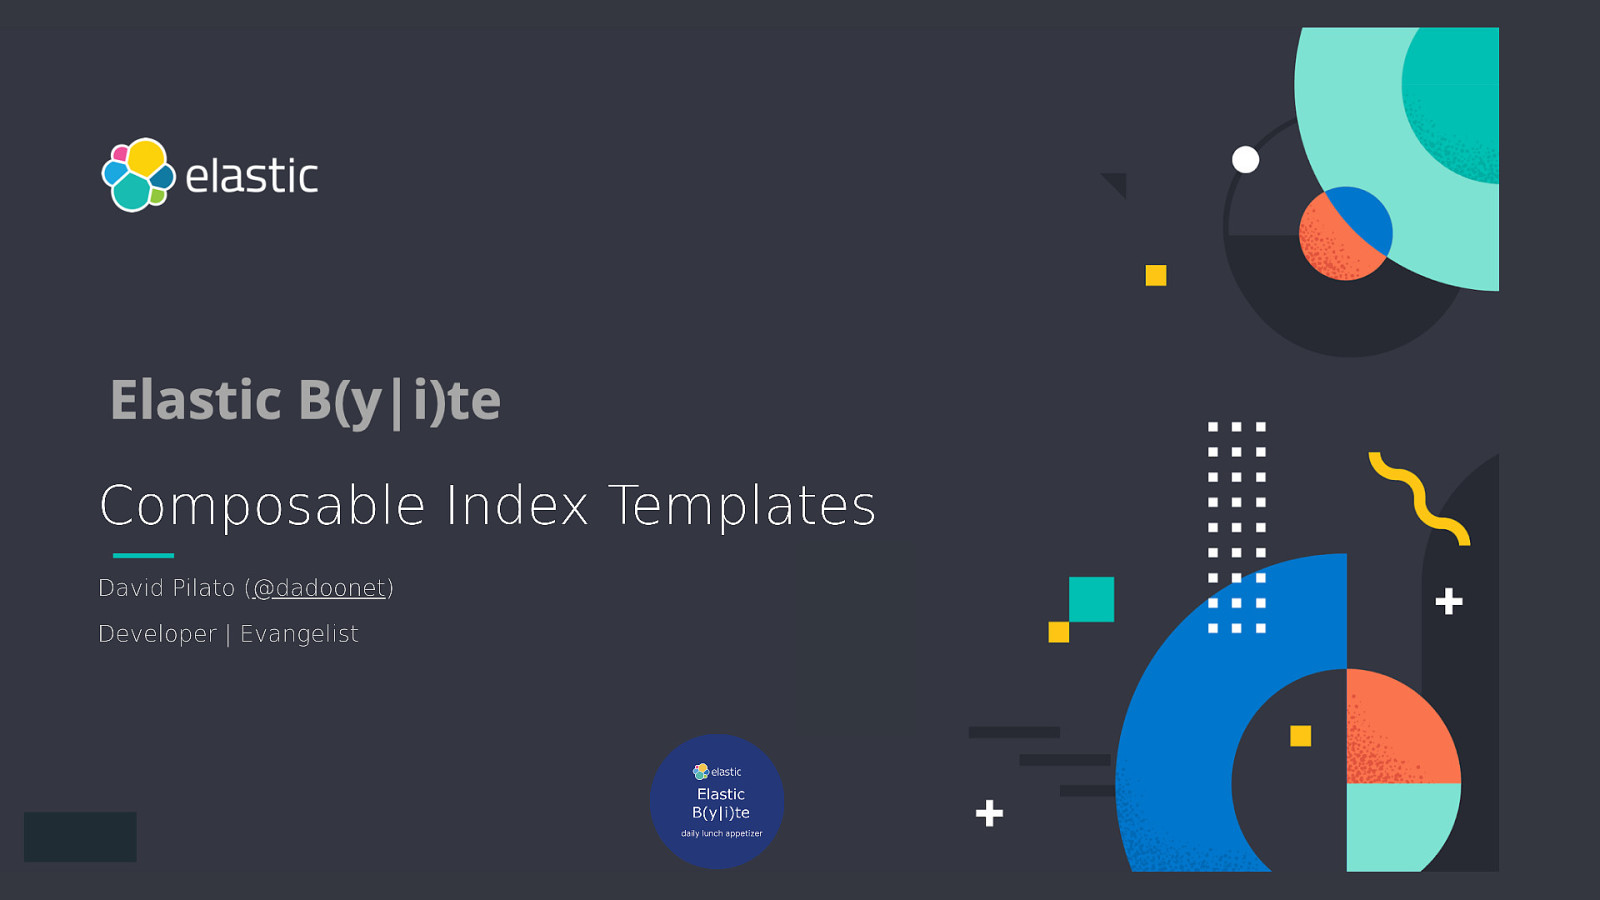 Composable Index Templates